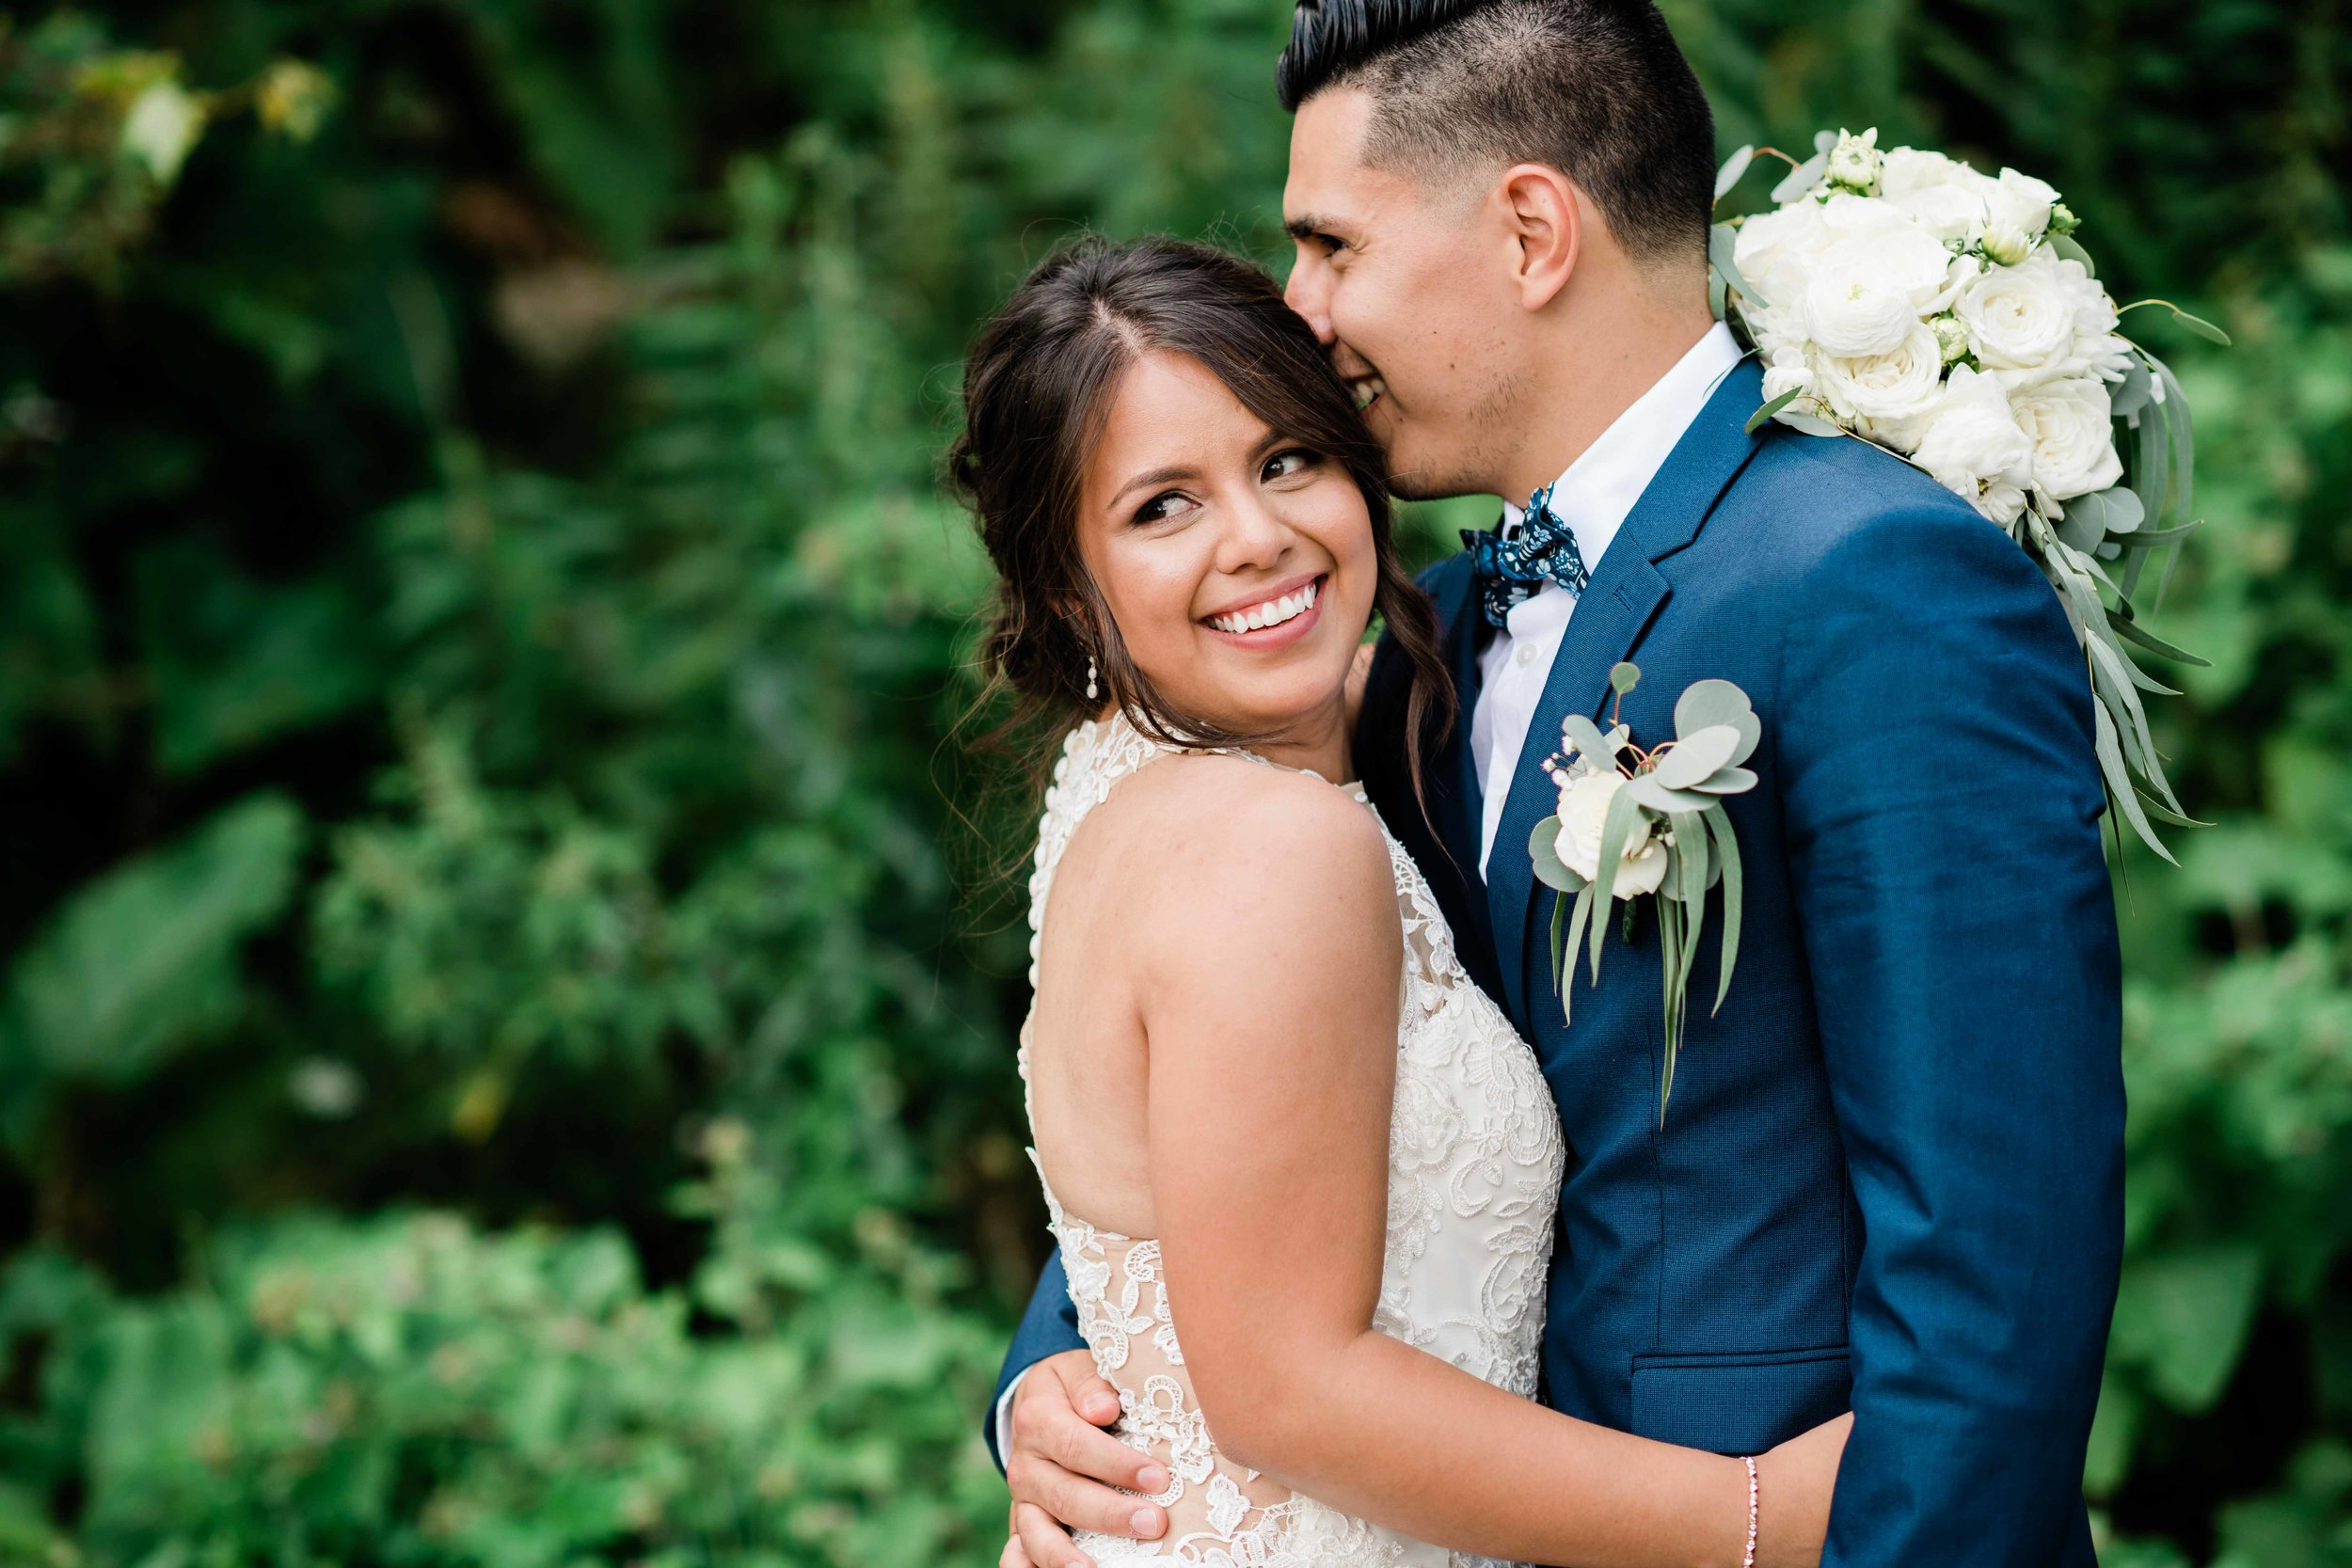 Groom kisses bride's head as she smiles